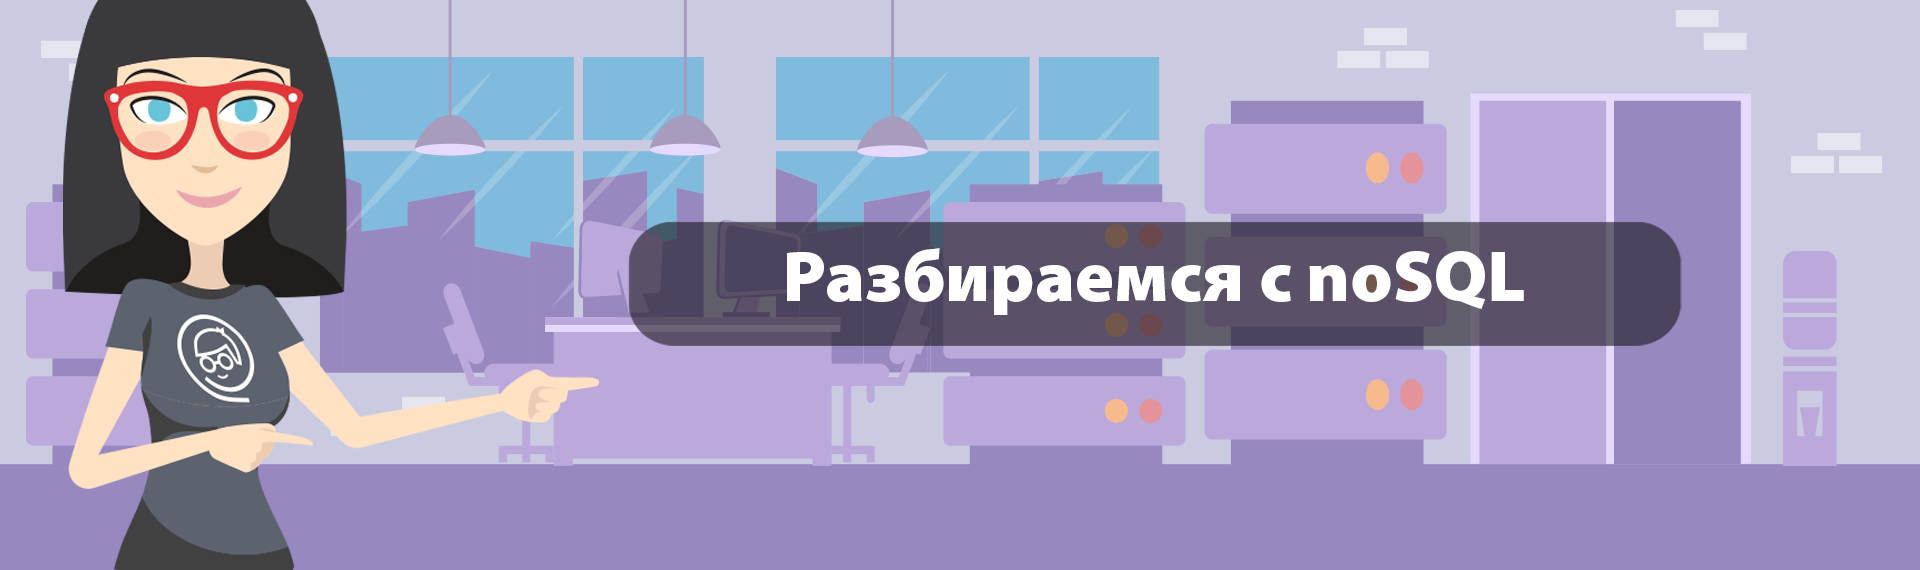 https://webhost1.ru/upload/email/2021/%20NoSQL-1.PNG